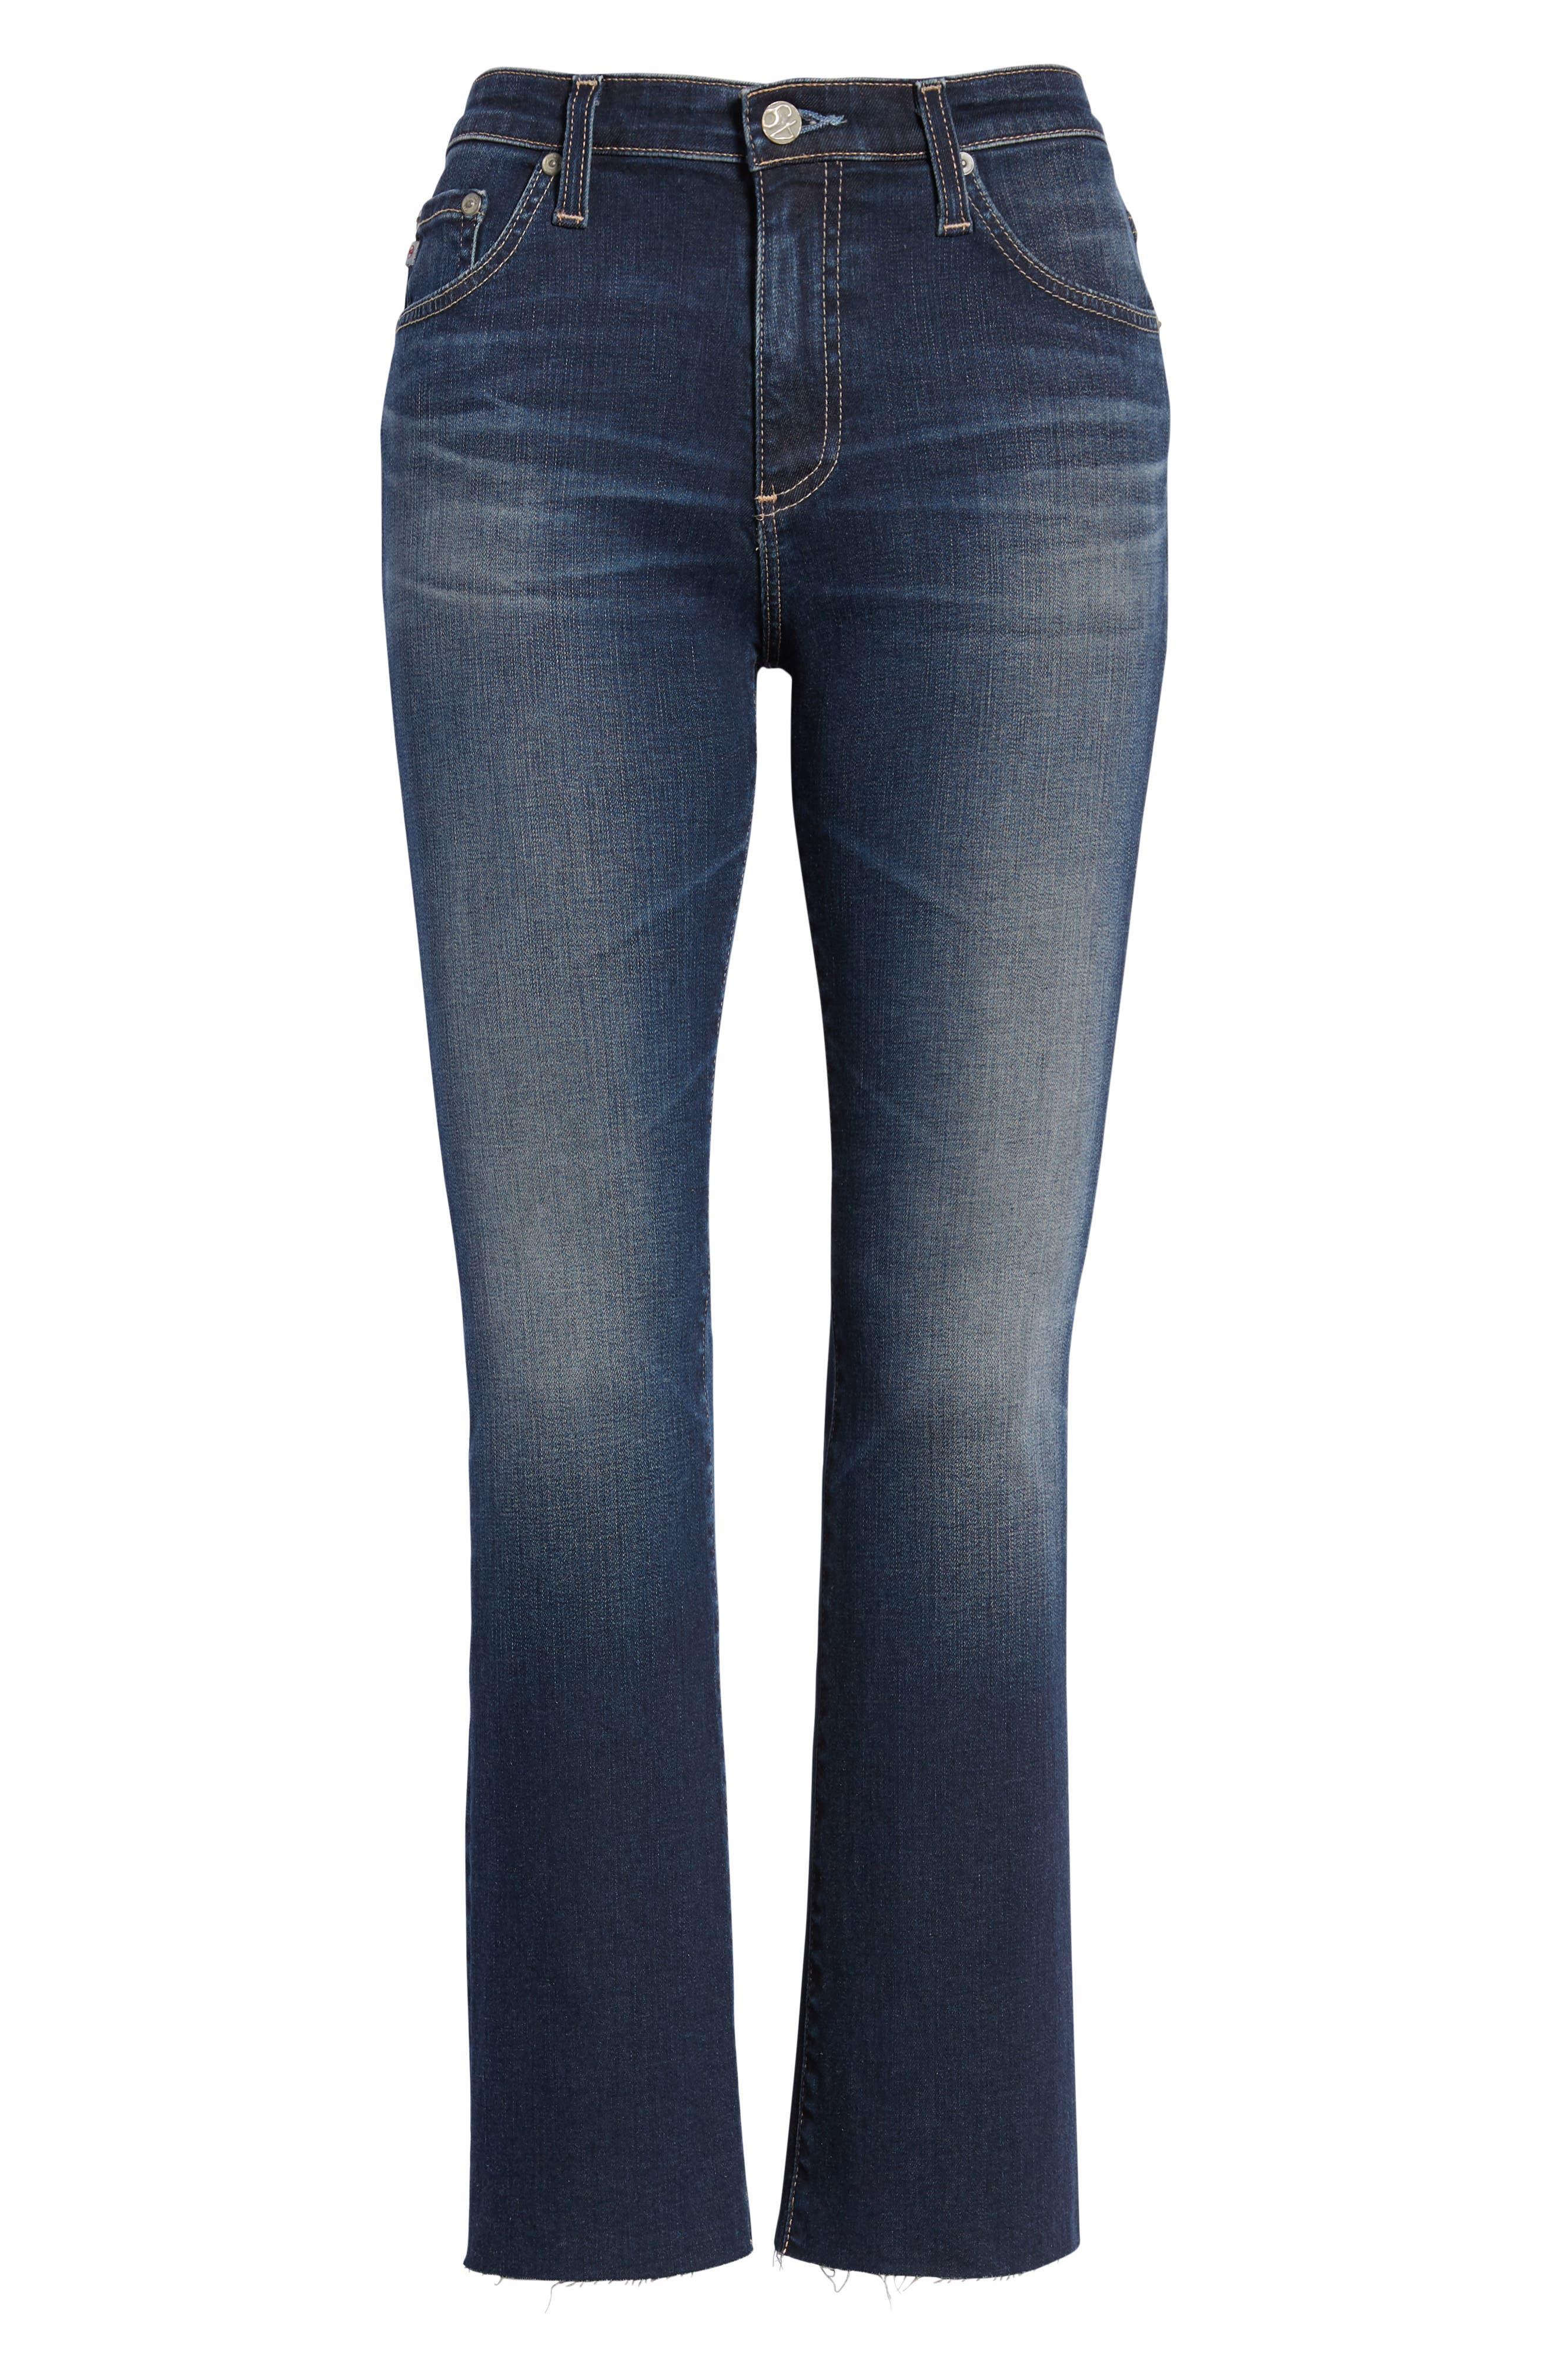 Jodi Raw Hem Crop Flare Jeans,                             Alternate thumbnail 7, color,                             10Y PURSUED